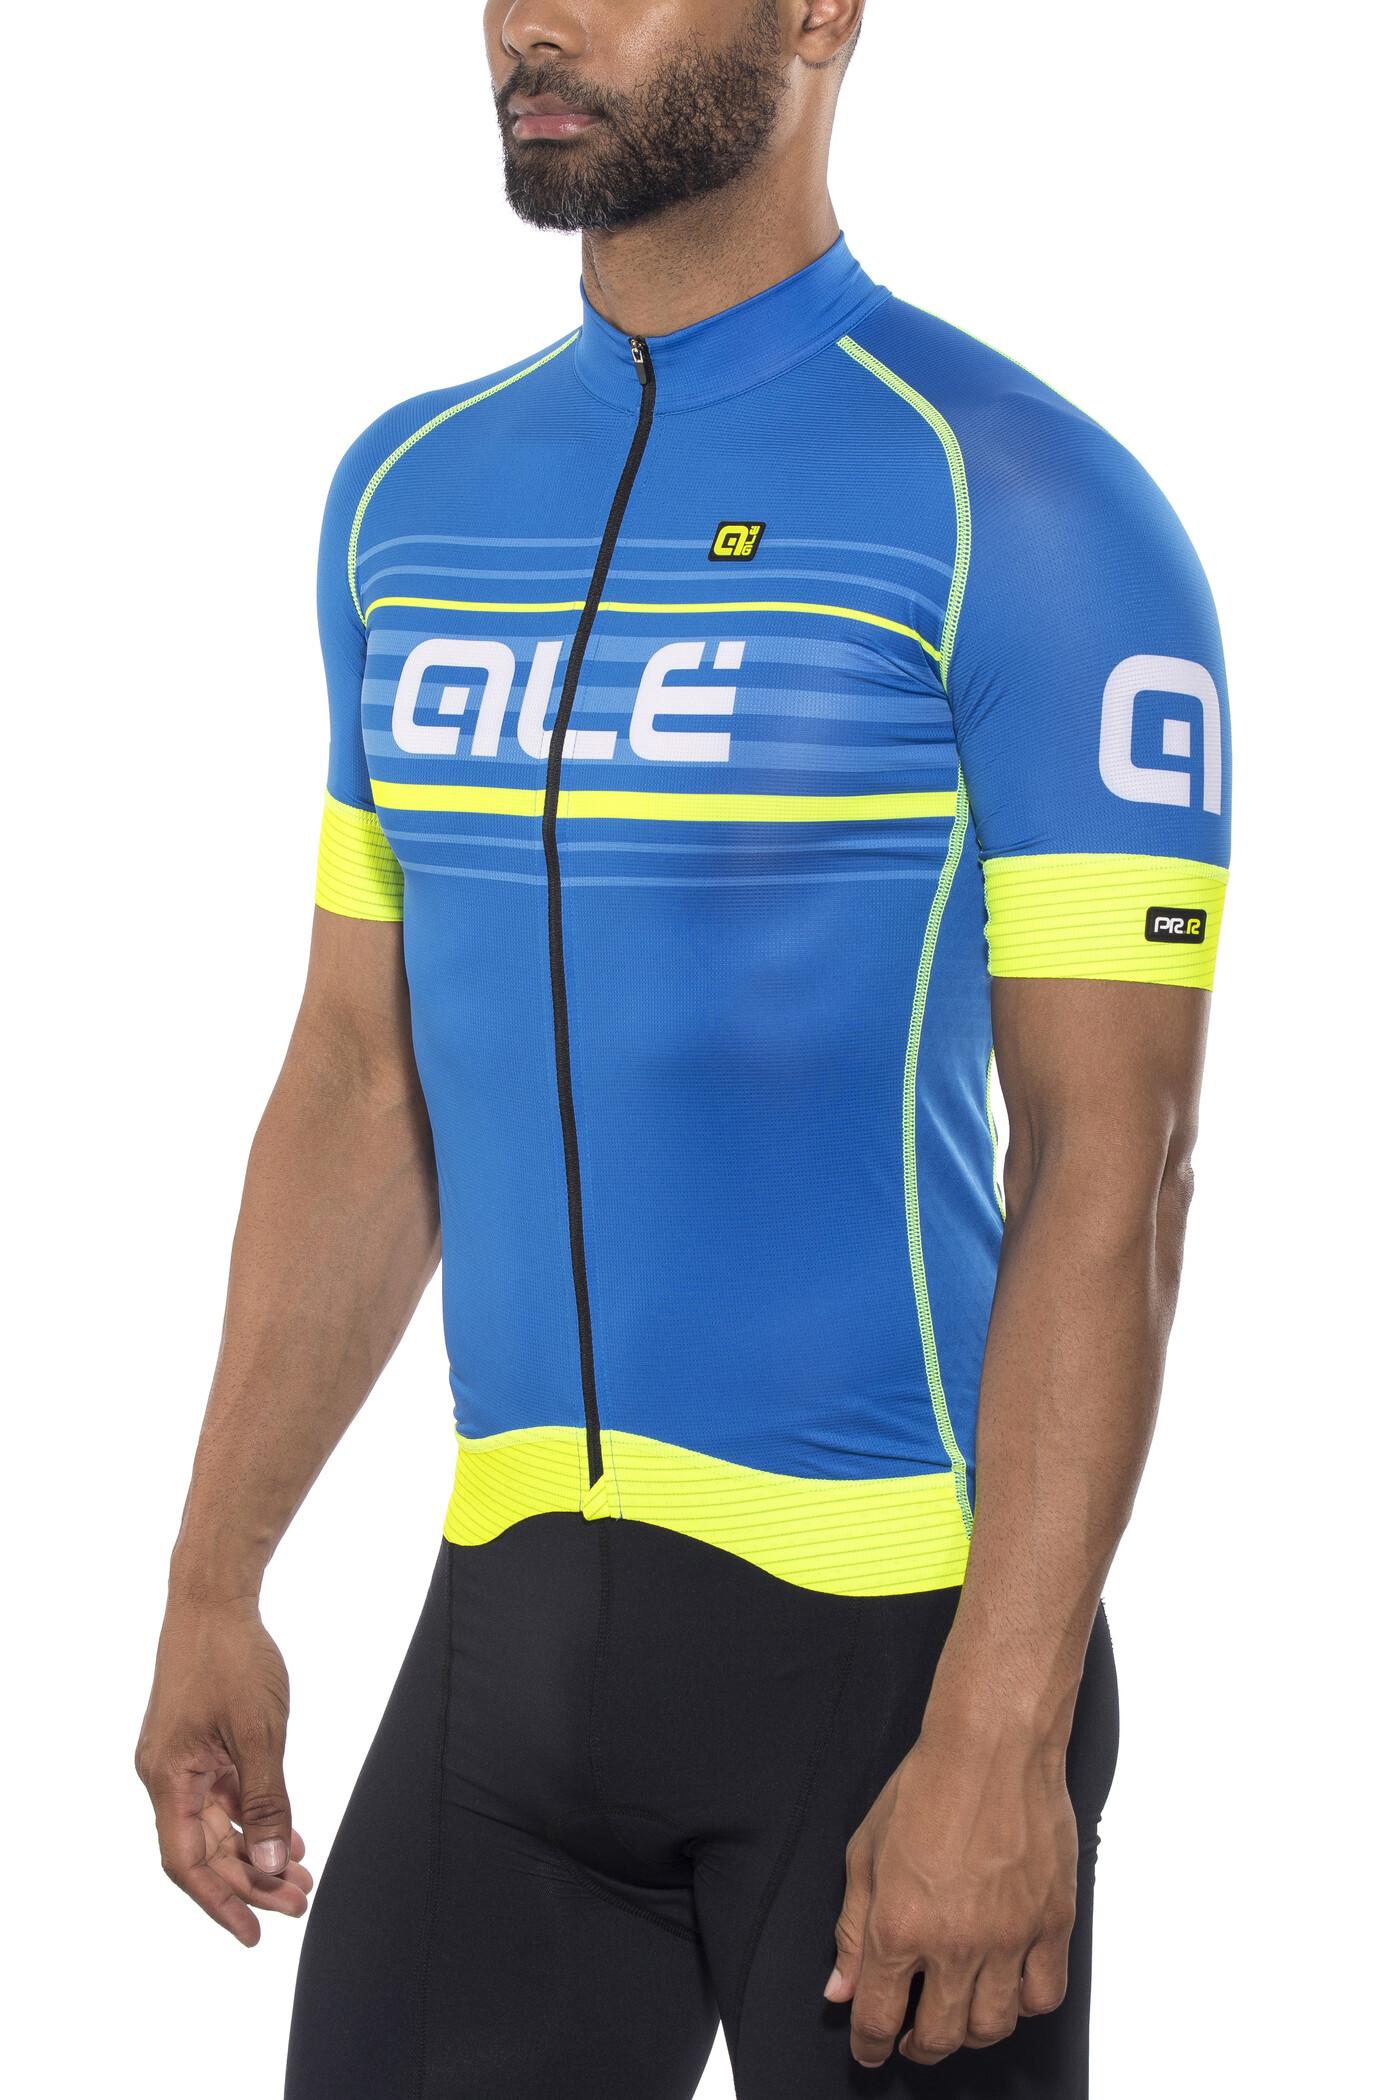 Al  Cycling Graphics PRR Salita Short Sleeve Jersey Men blue-fluo yellow.jpg c632462ea